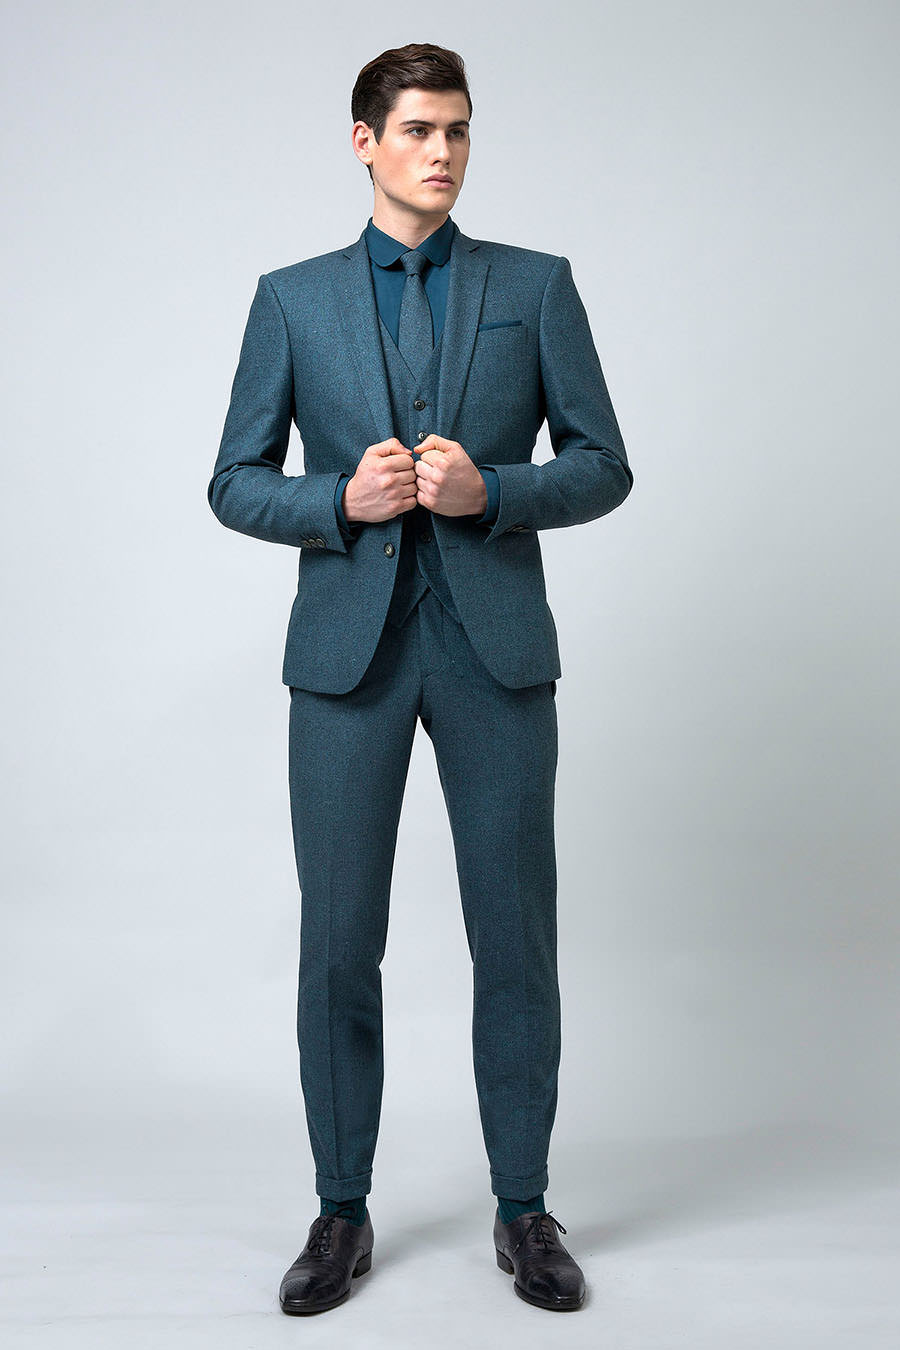 samonsurmesureH16 costume bleu canard - web